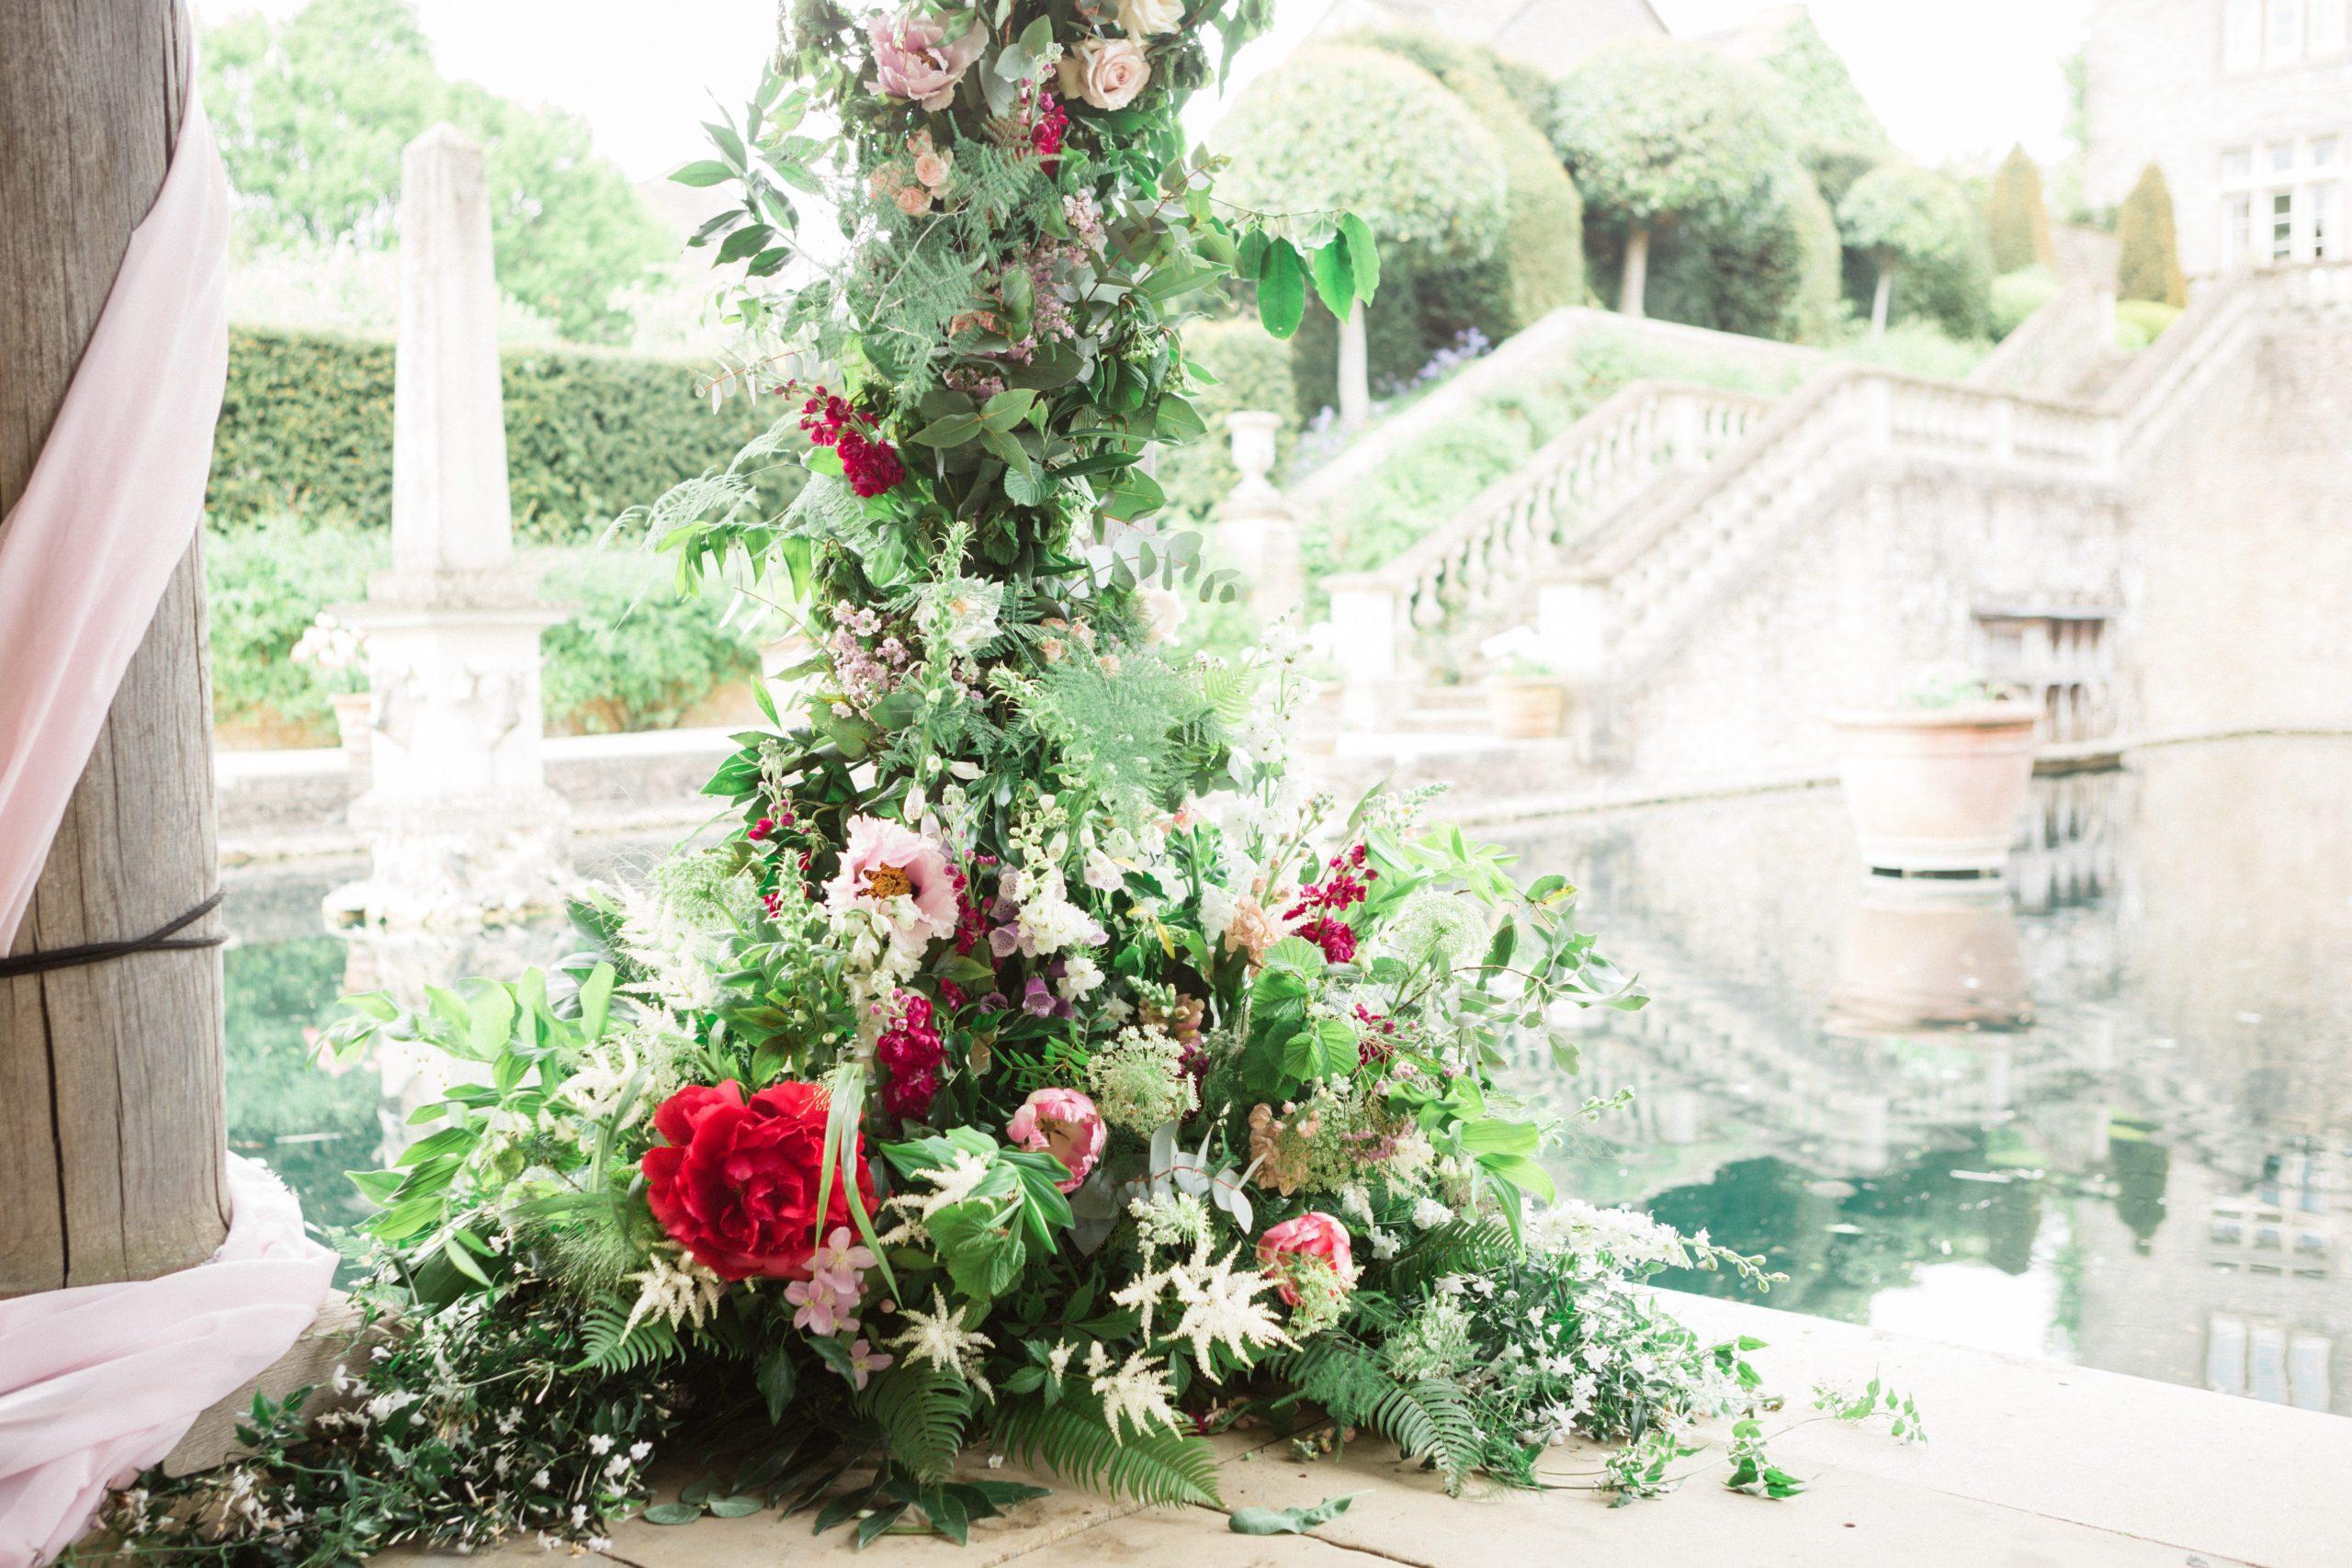 Euridge Manor floristry wild and co